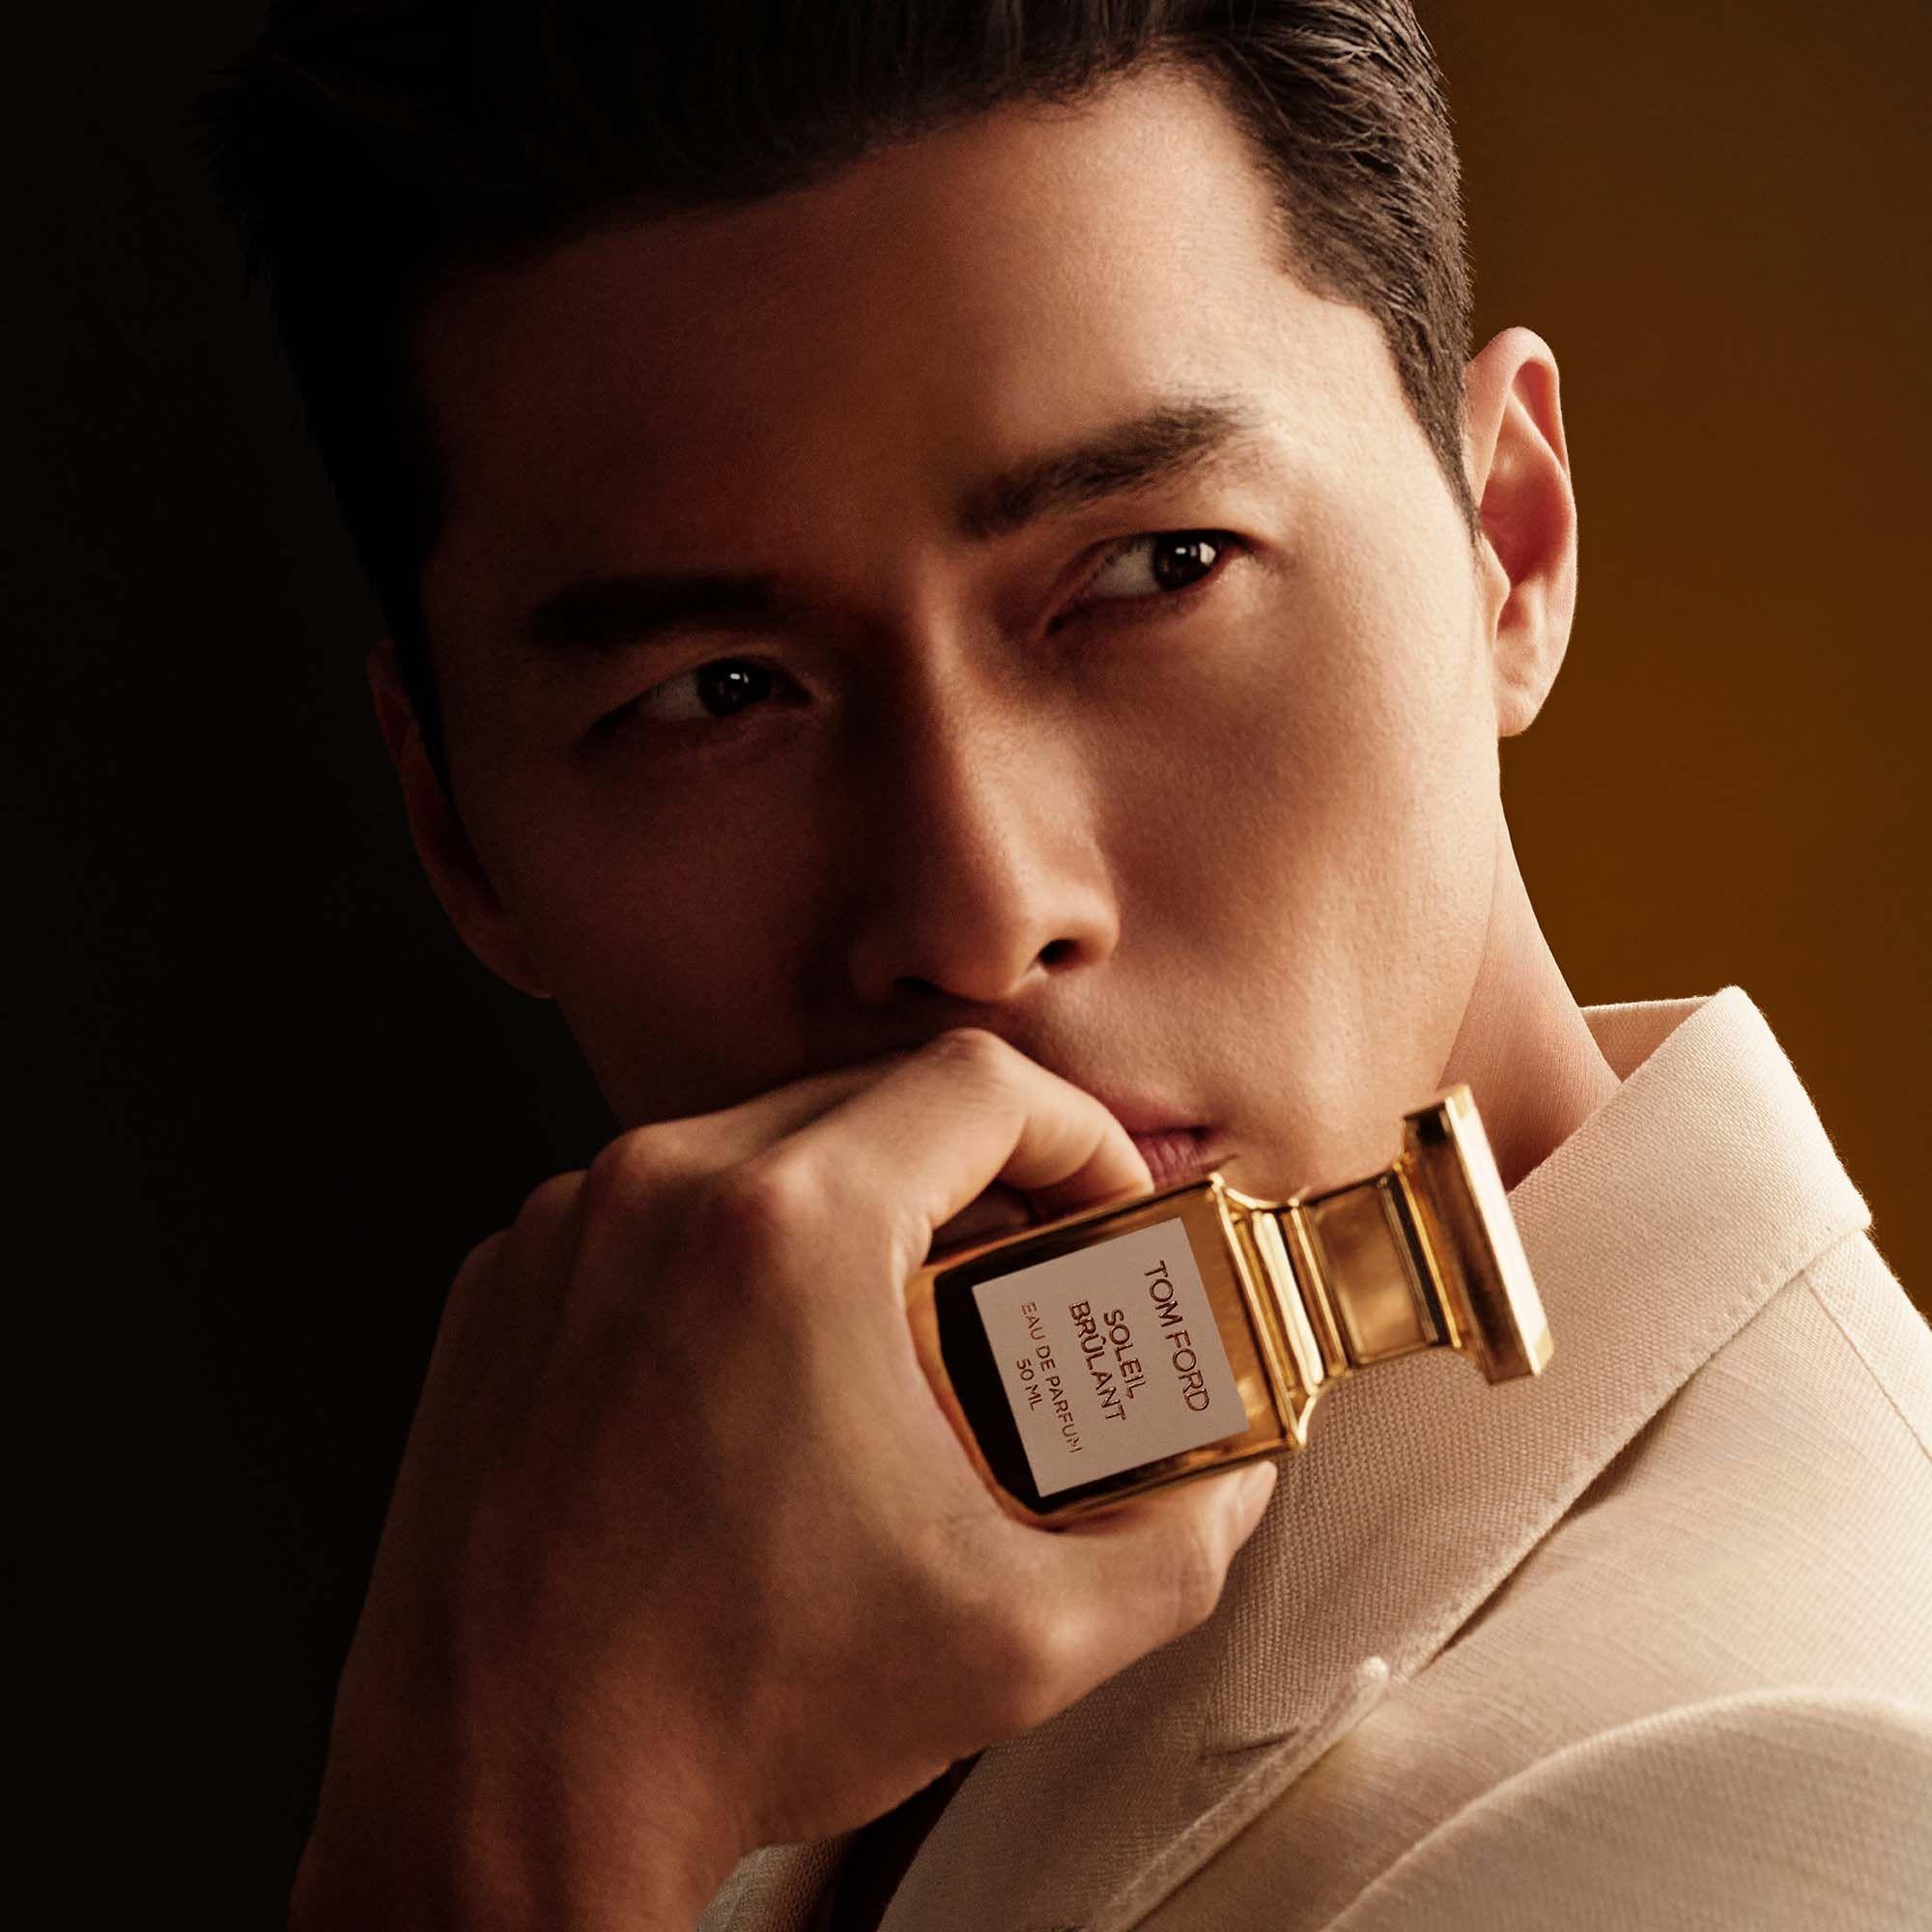 Tom Ford Appoints Hyun Bin As New Fragrance Ambassador